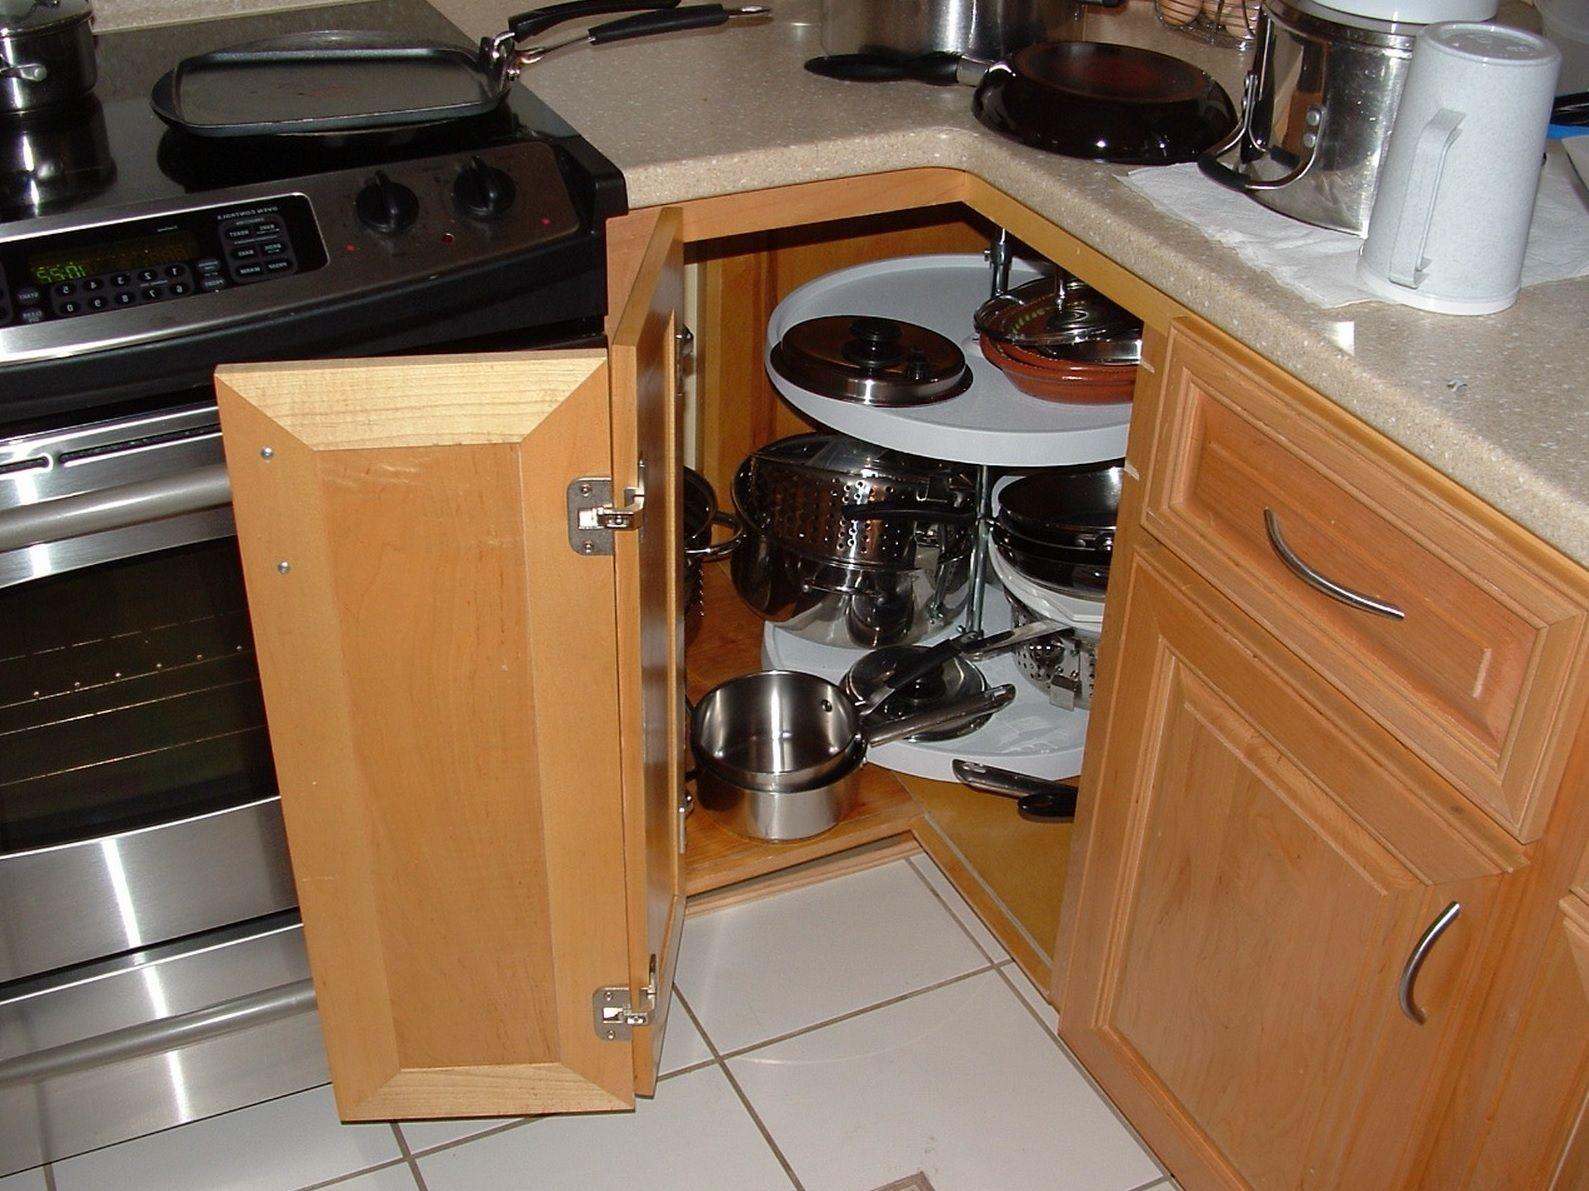 Keptalalat A Kovetkezore Konyhai Sarokszekreny Ajto Corner Kitchen Cabinet Kitchen Cabinets Pictures Kitchen Cabinets Hinges